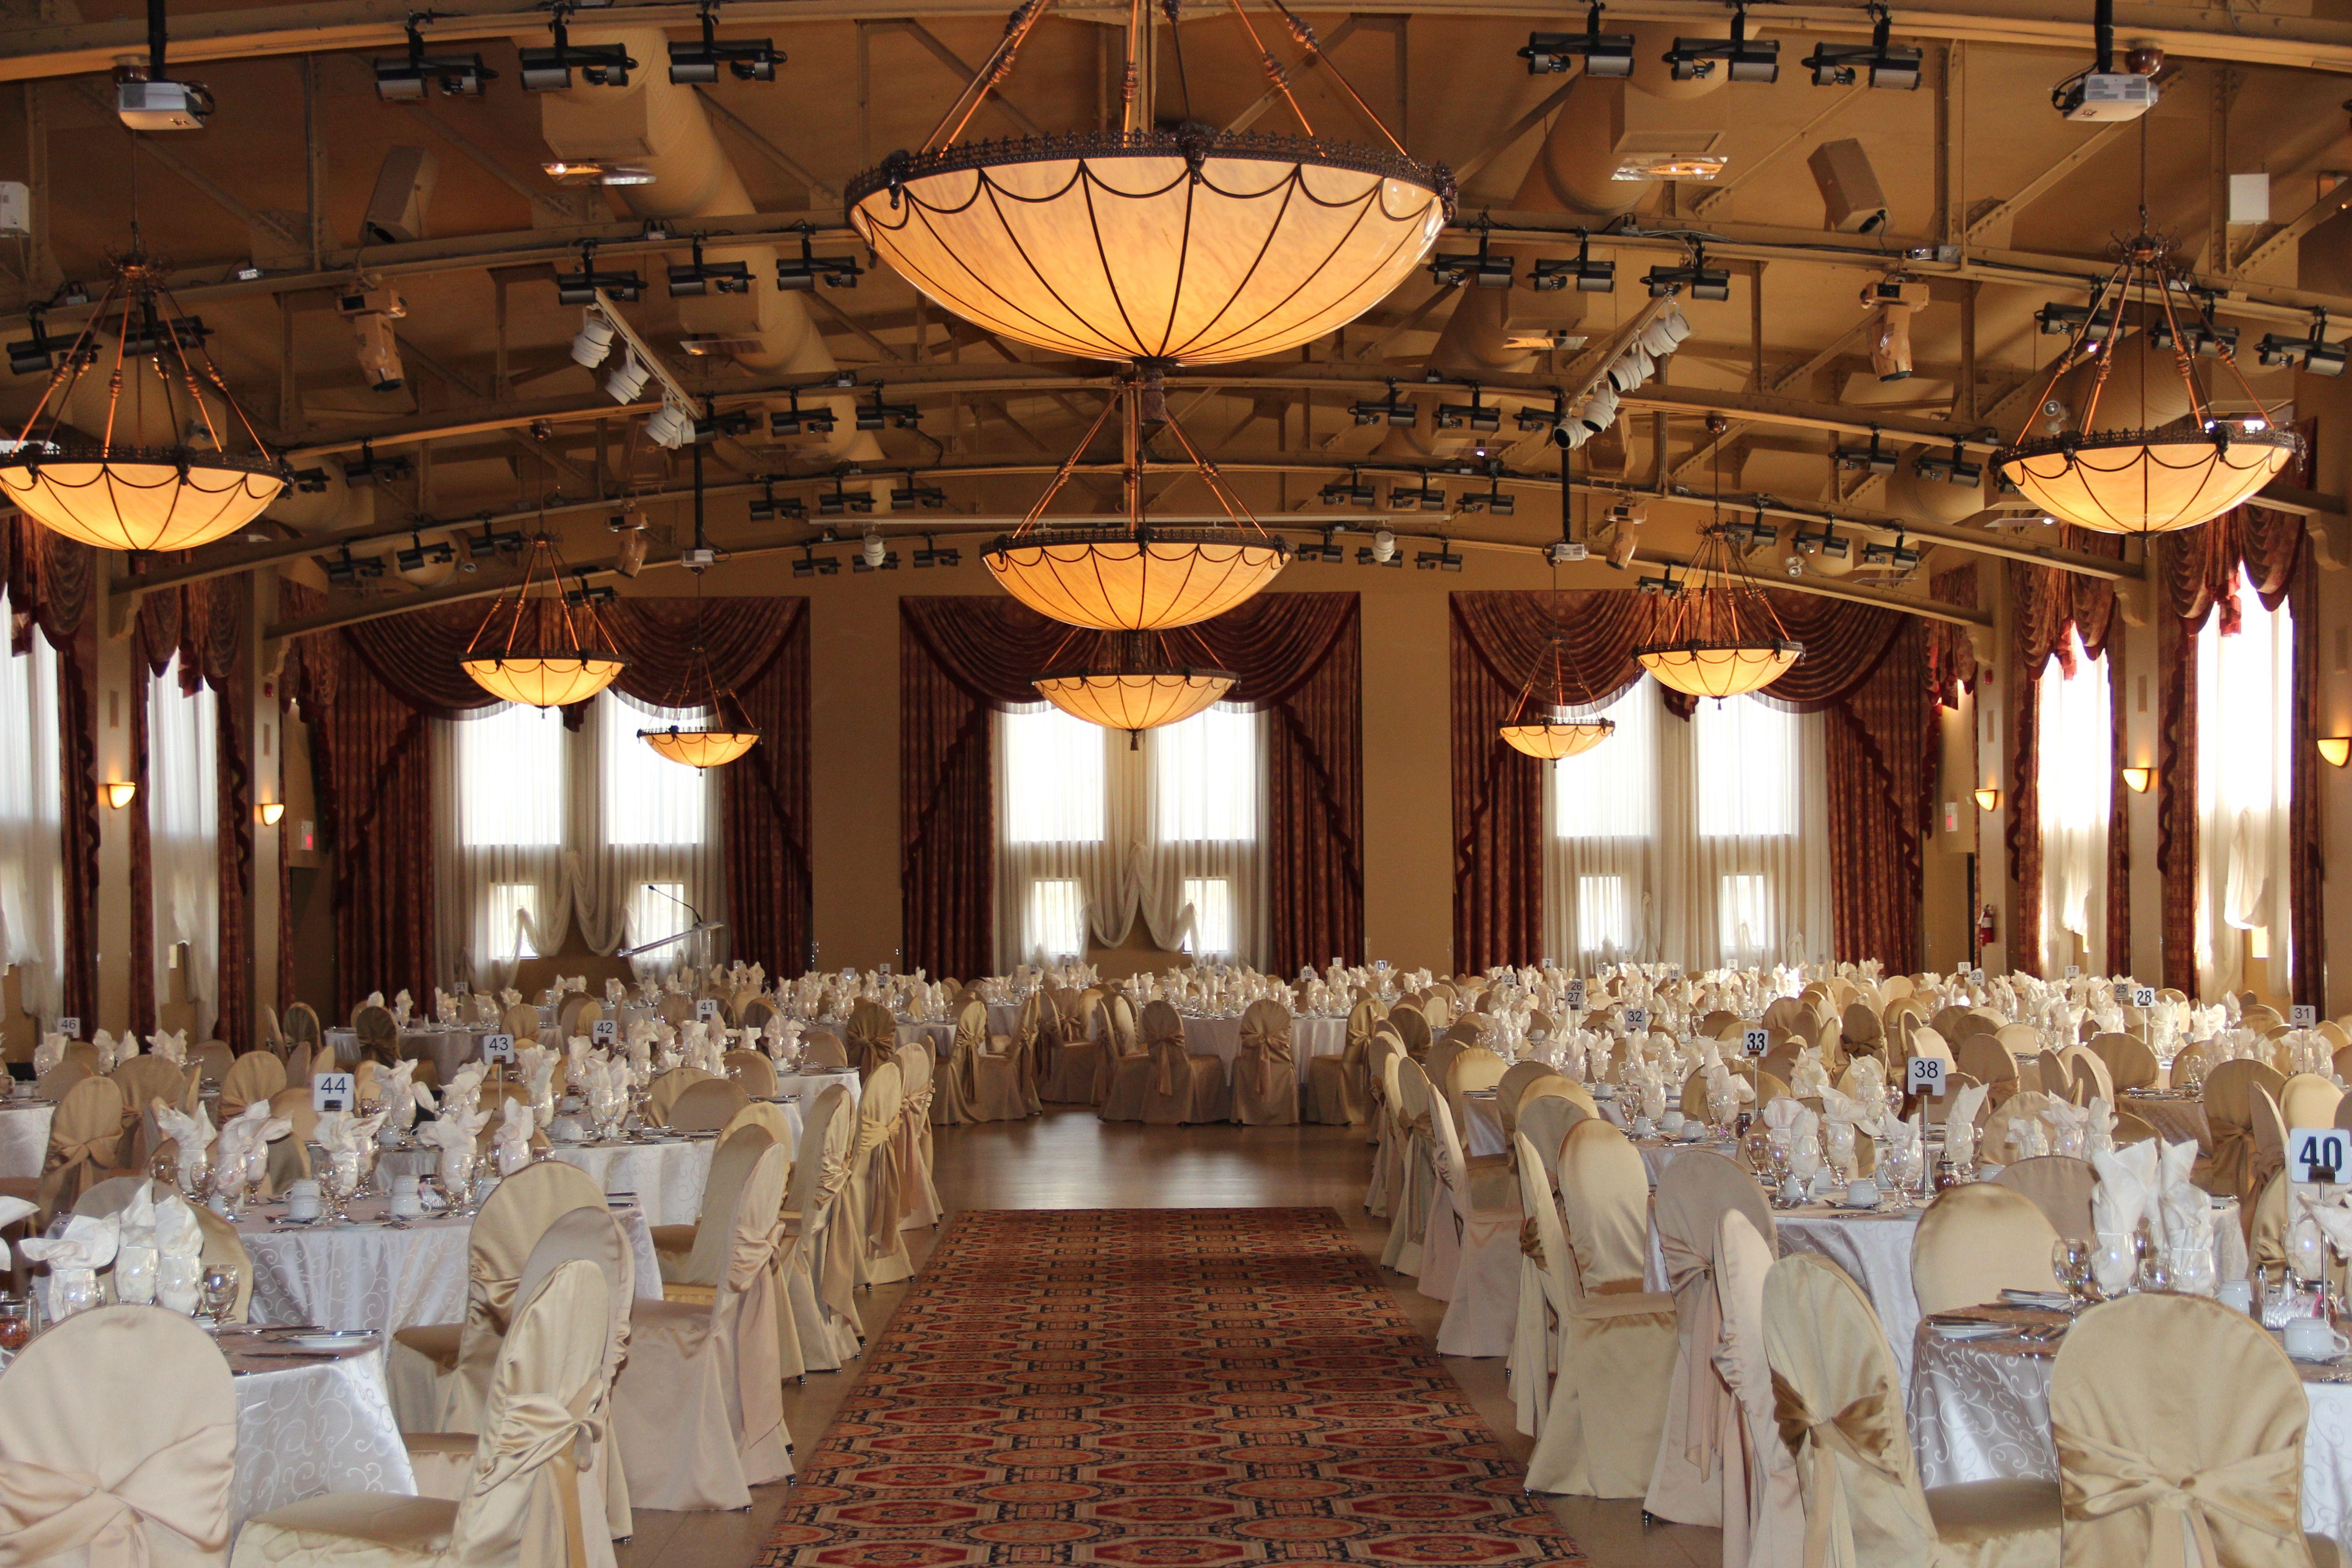 Grand Central Ballroom Liuna Station Hamilton Ontario Wedding Venue Banquet Hall